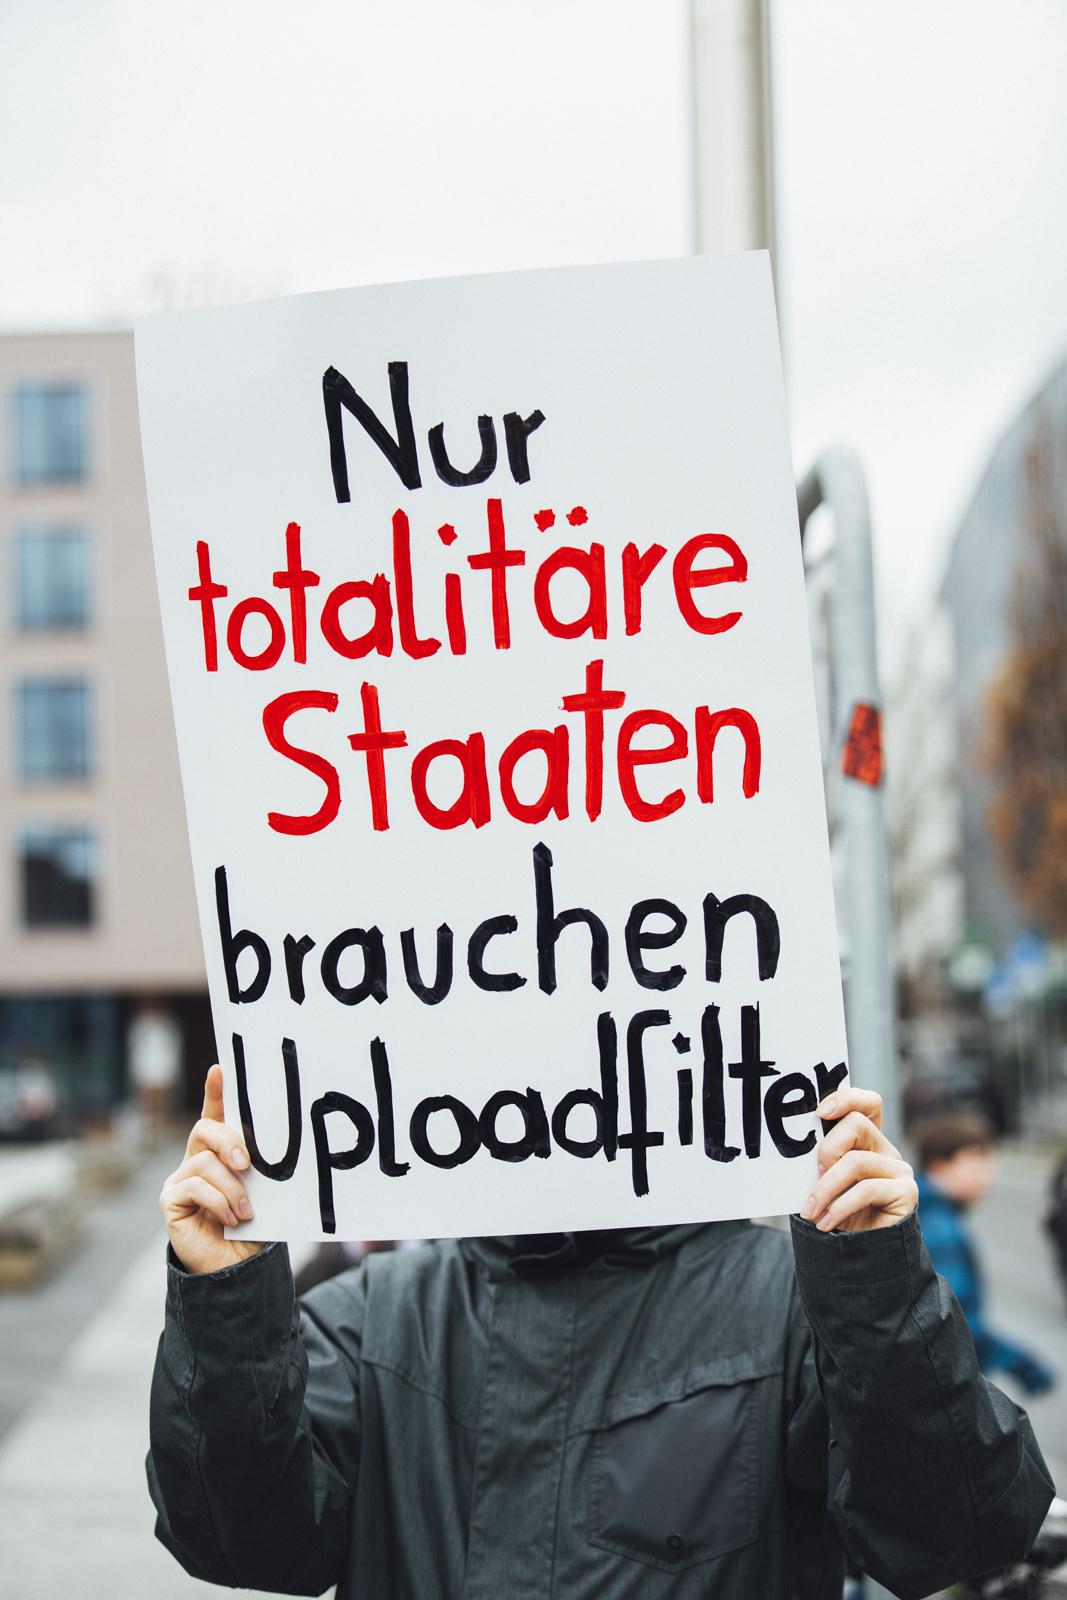 Save Your Internet – Demo against Uploadfilter – Article 13